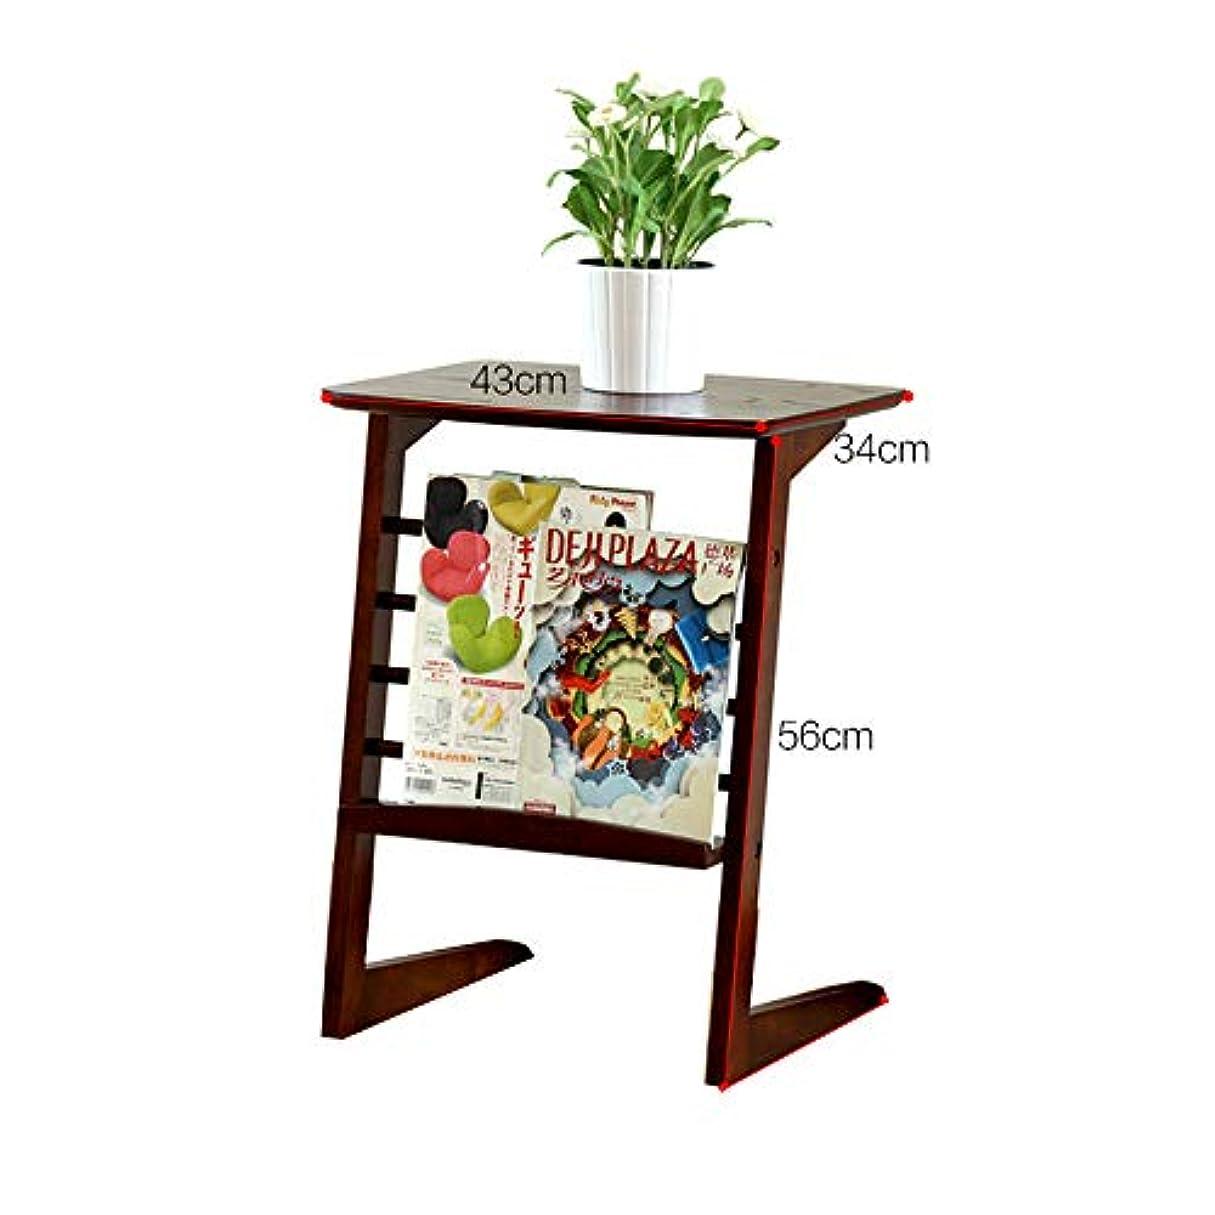 HUO 純木のサイドテーブルの移動式コーヒーテーブルの簡単なソファーのベッドサイドテーブル-43 * 34 * 56 cm